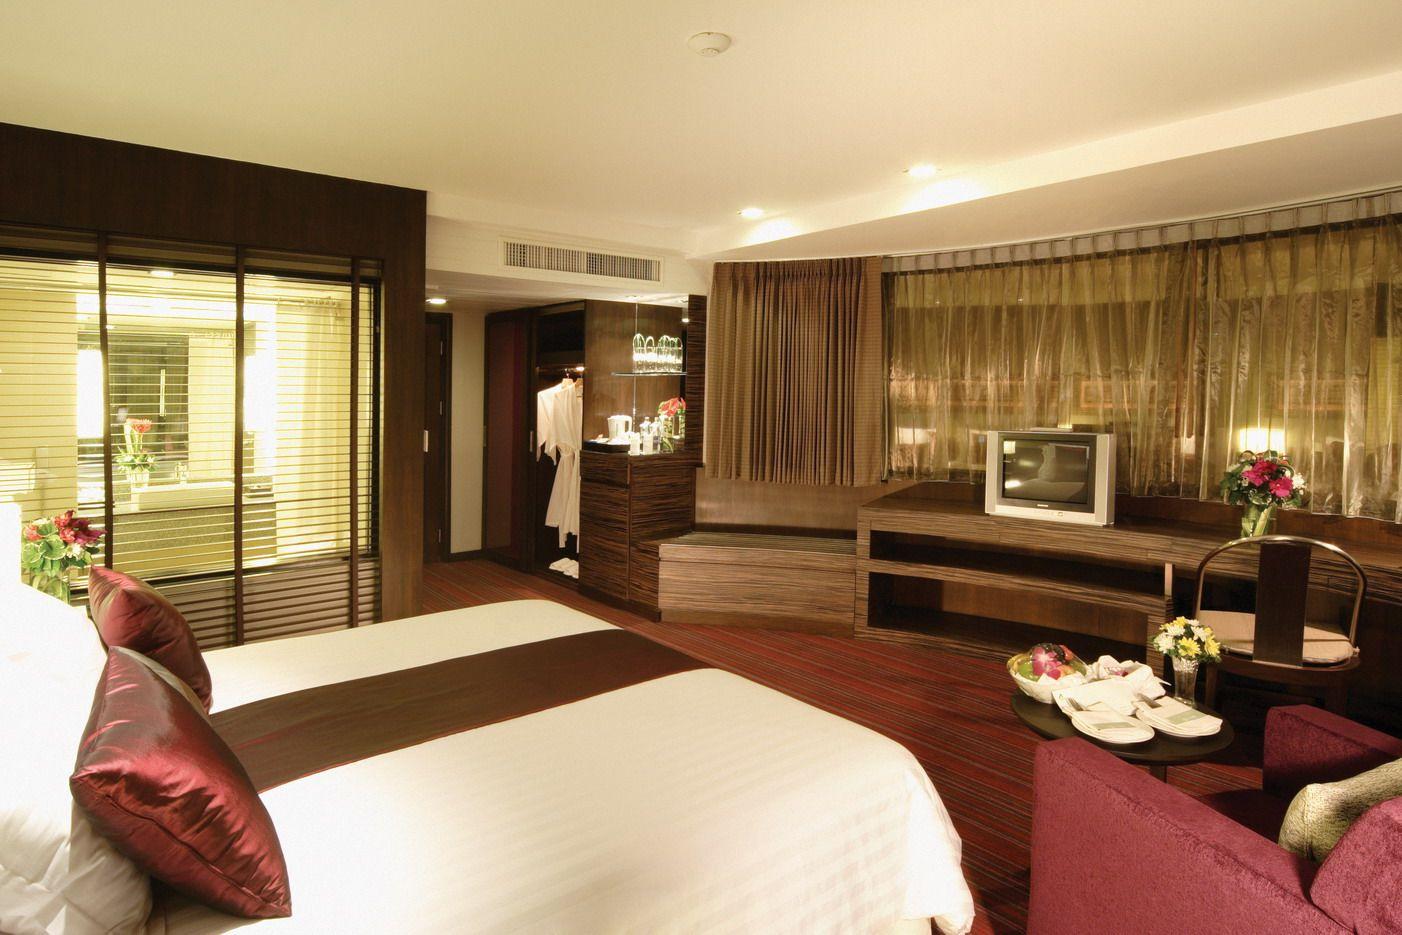 The basics of a good hotel room design - Interior Design Explained | Hotel  room design, Modern hotel room, Luxury hotels interior